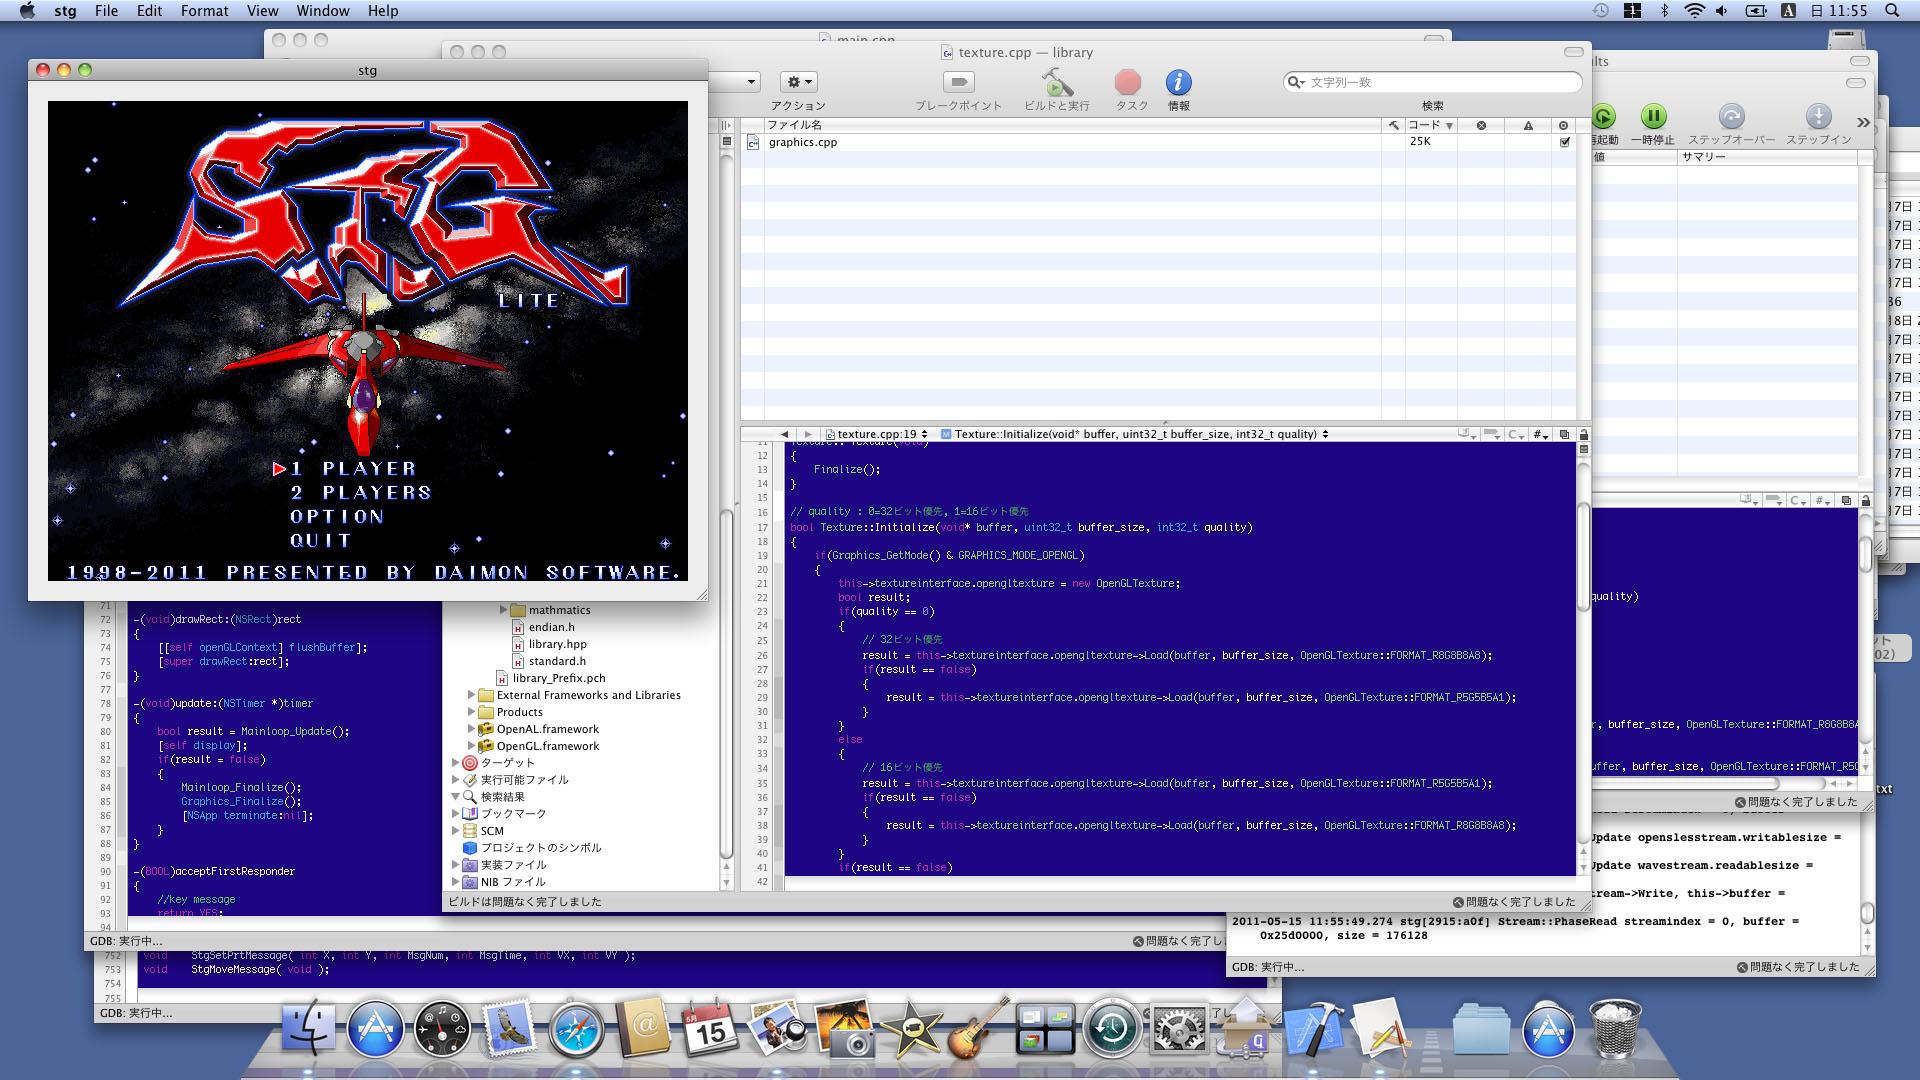 STG_OSX.jpg